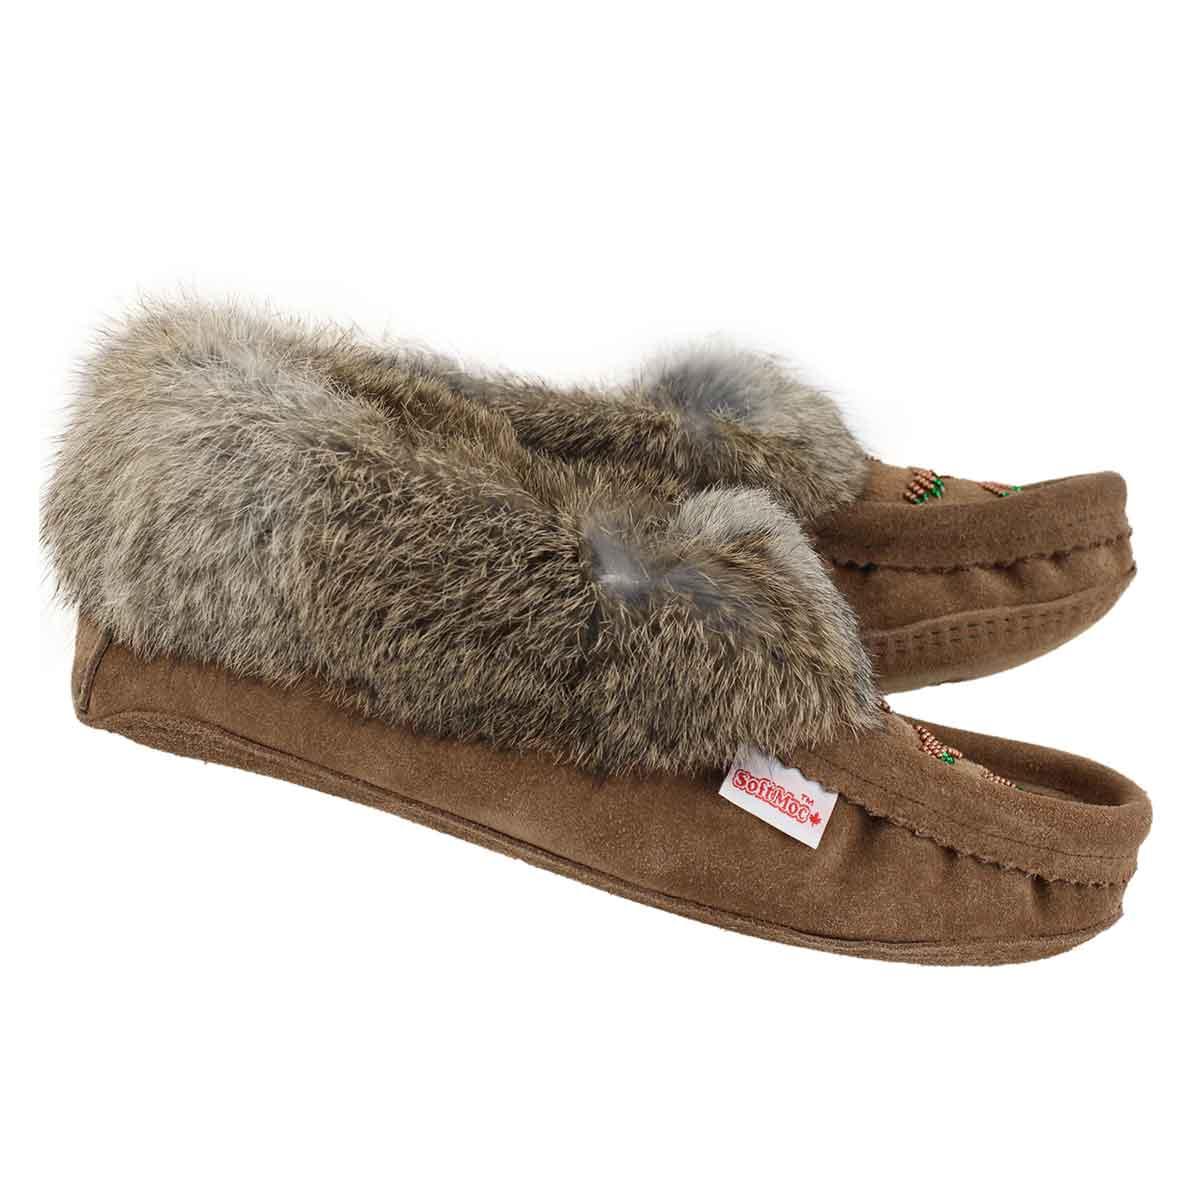 Lds tobacco rabbit fur moccasin